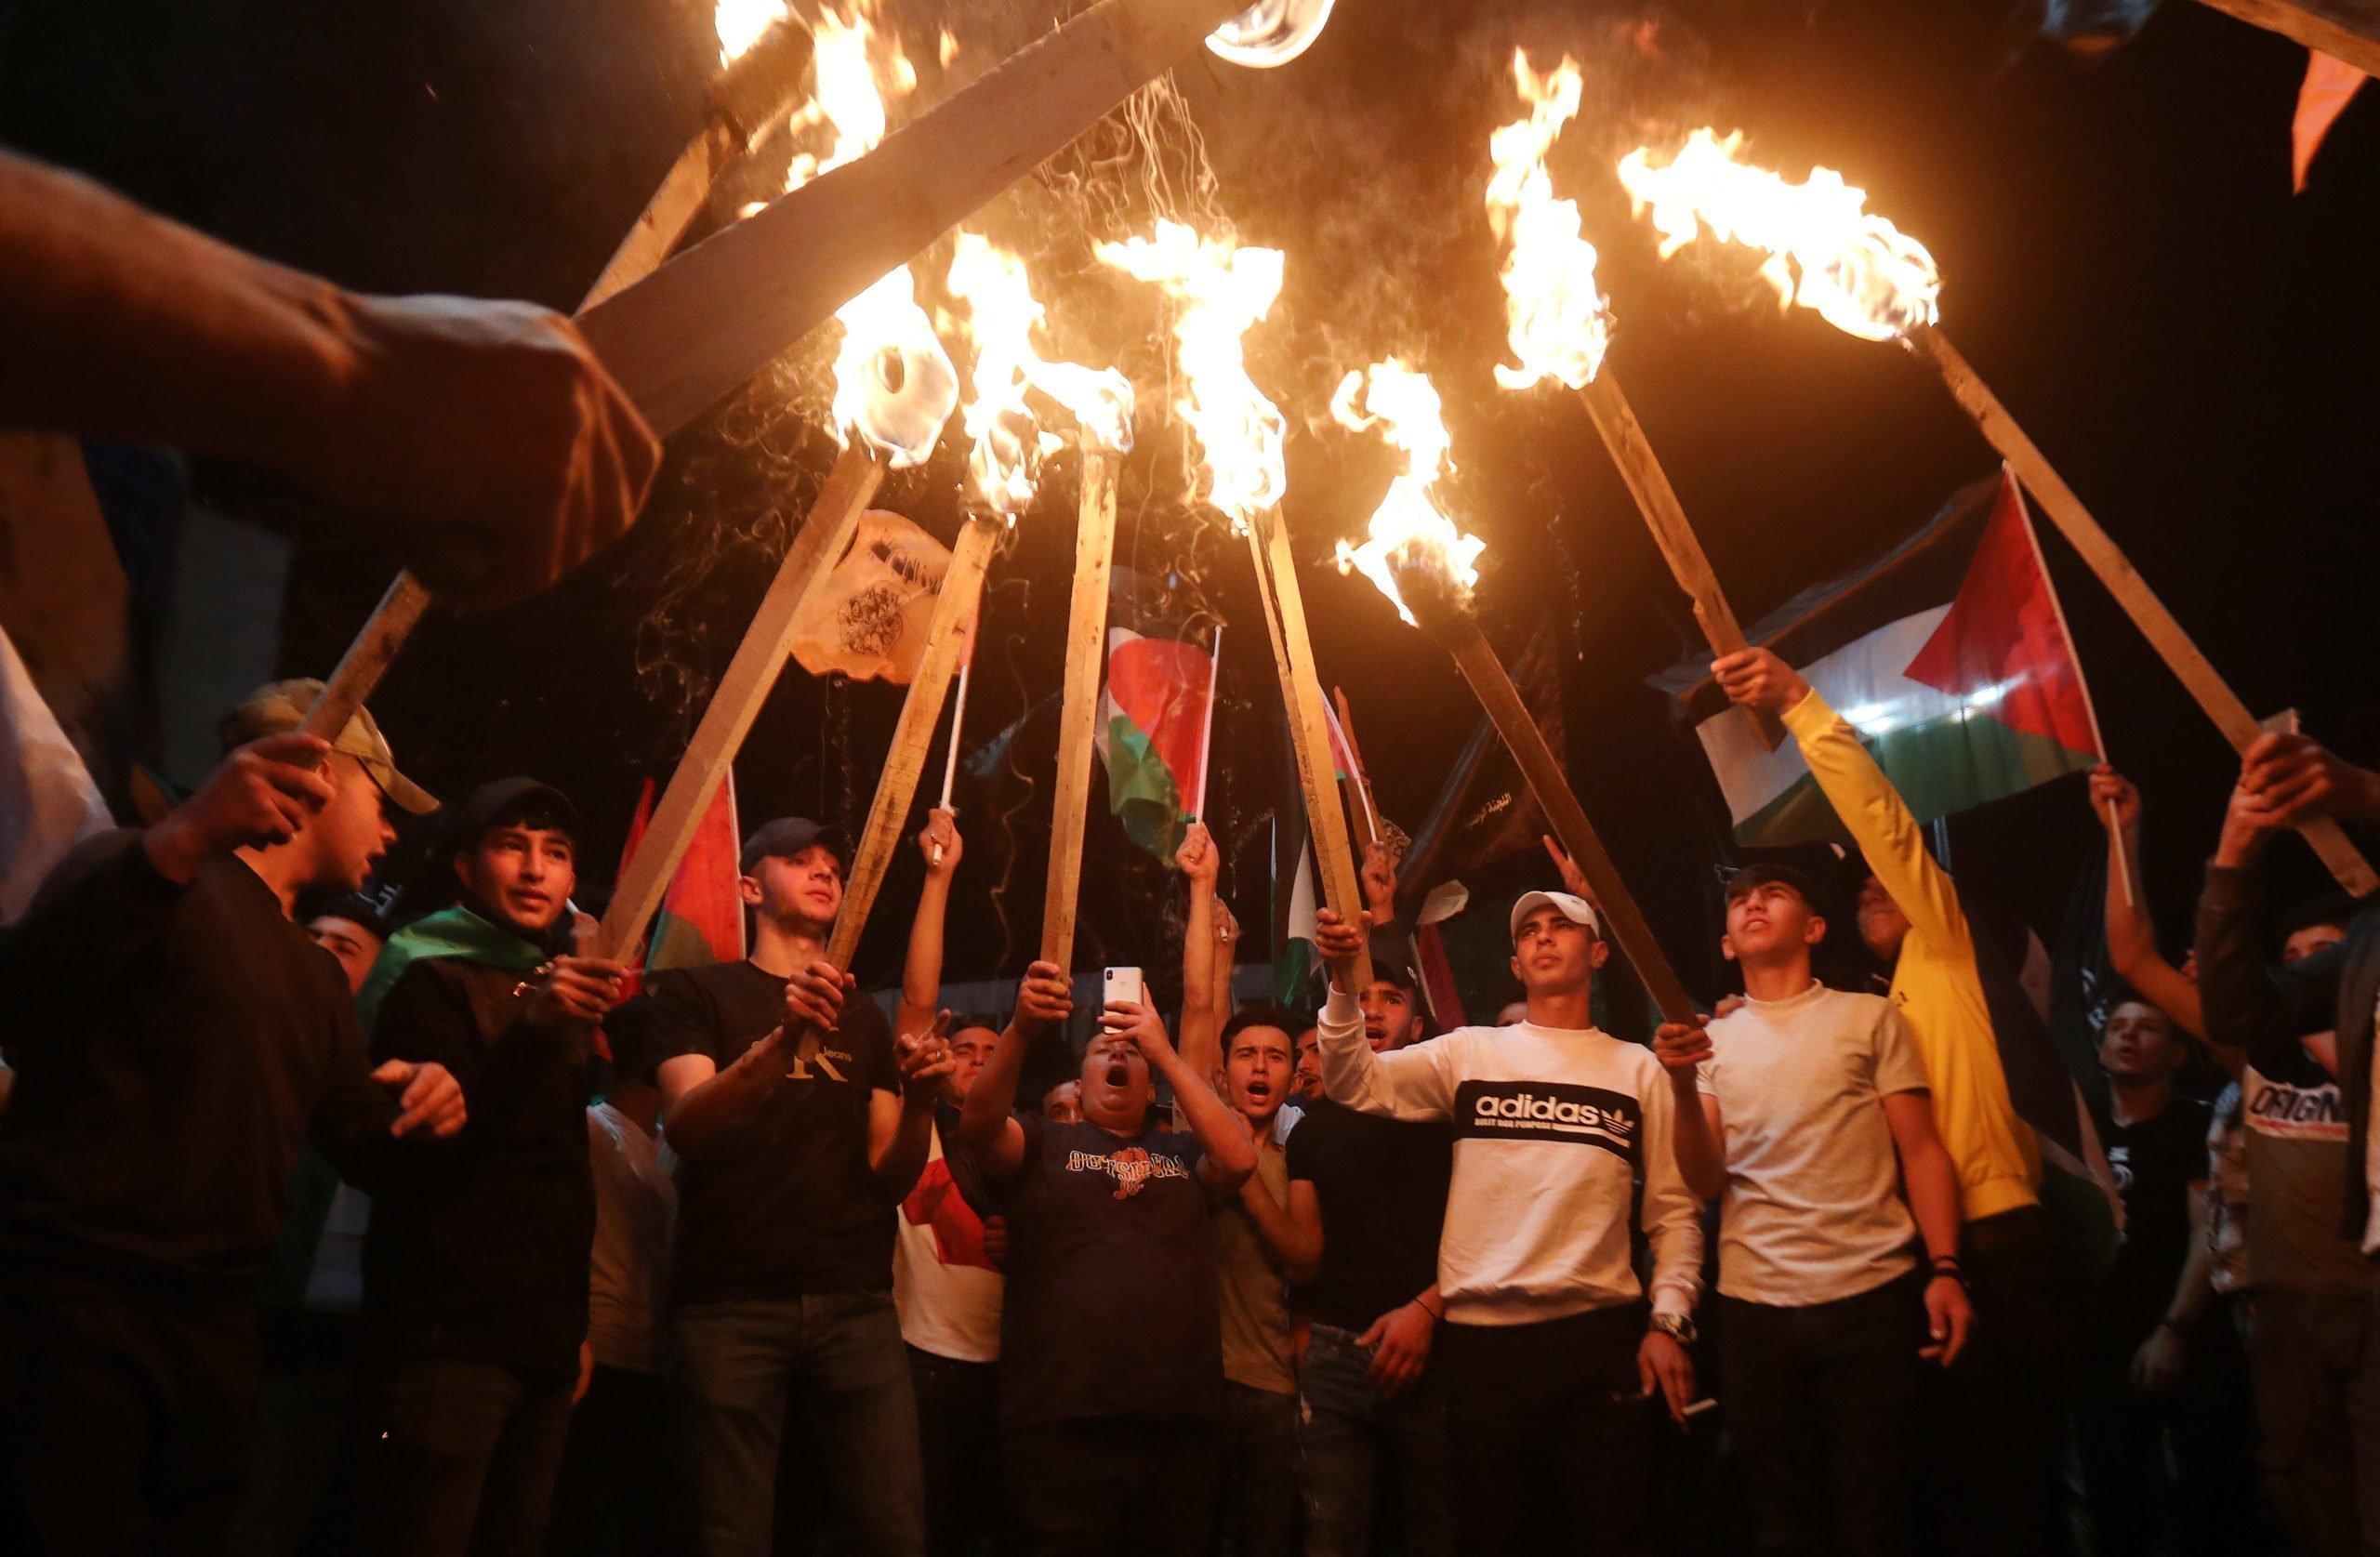 Ierousalim Palestine Israel 7 Scaled